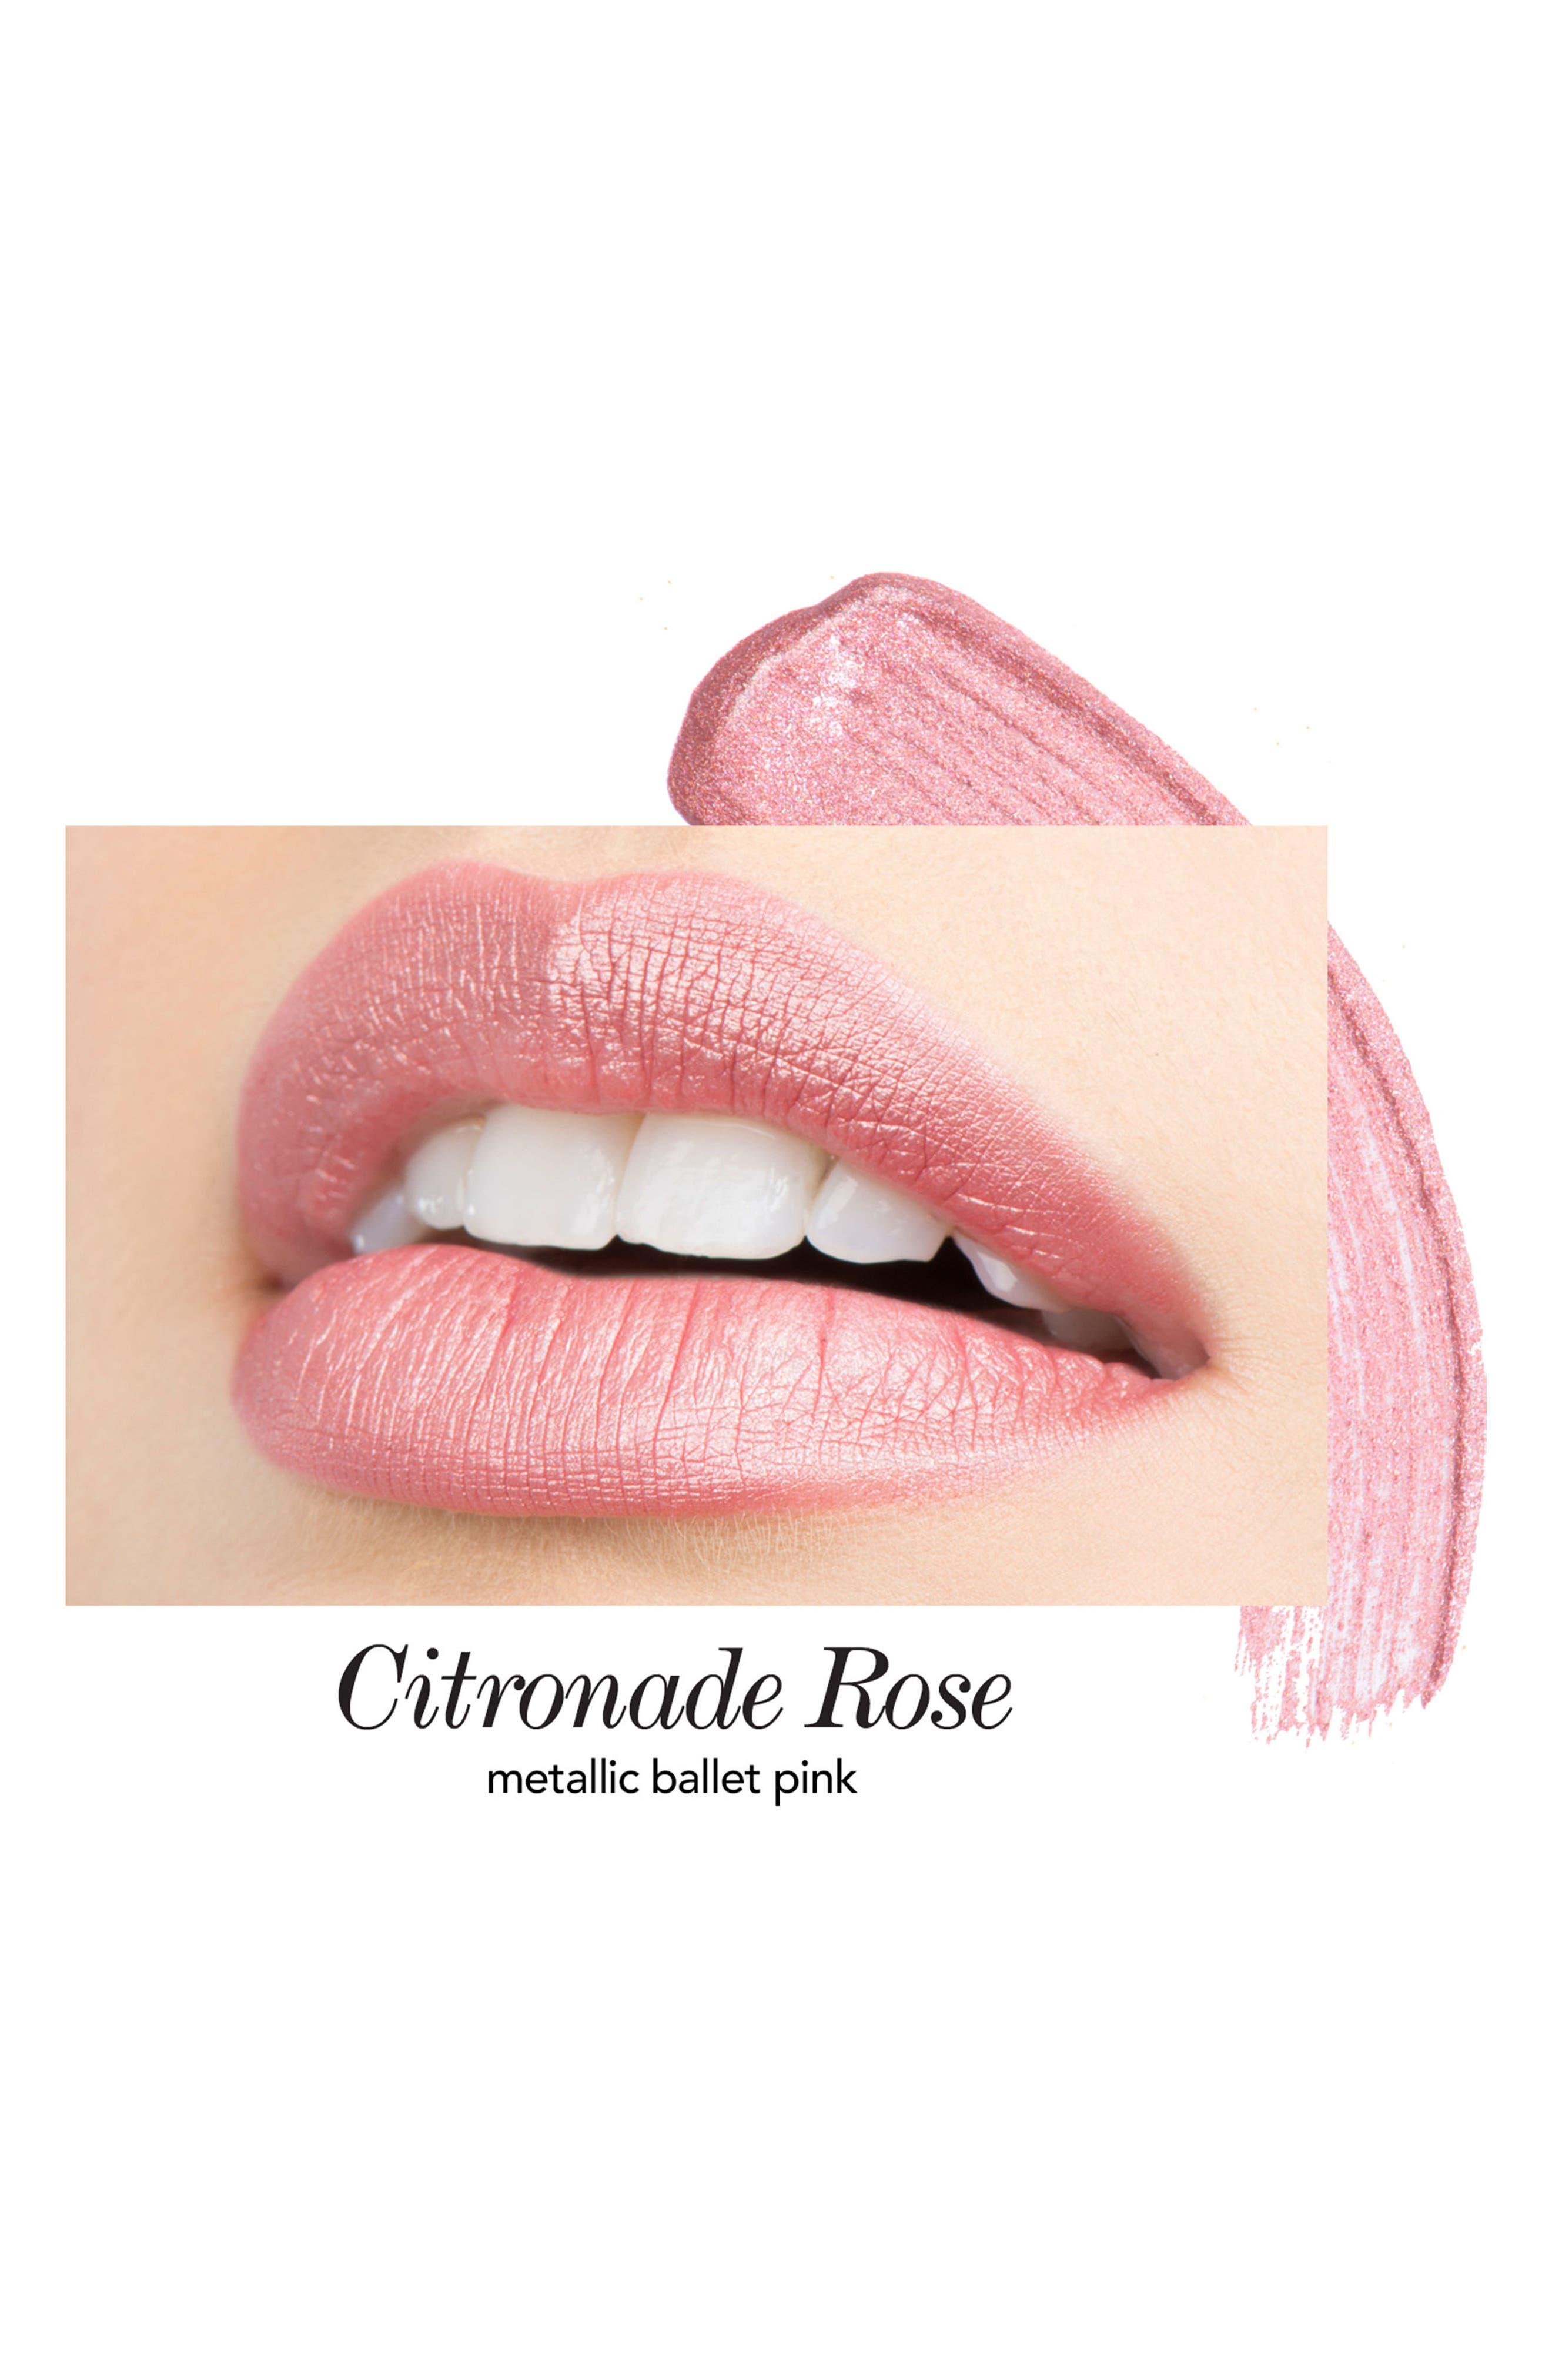 Melon & Citronade Rose Long-Wear Lip Crème Liquid Lipstick Duo,                             Alternate thumbnail 5, color,